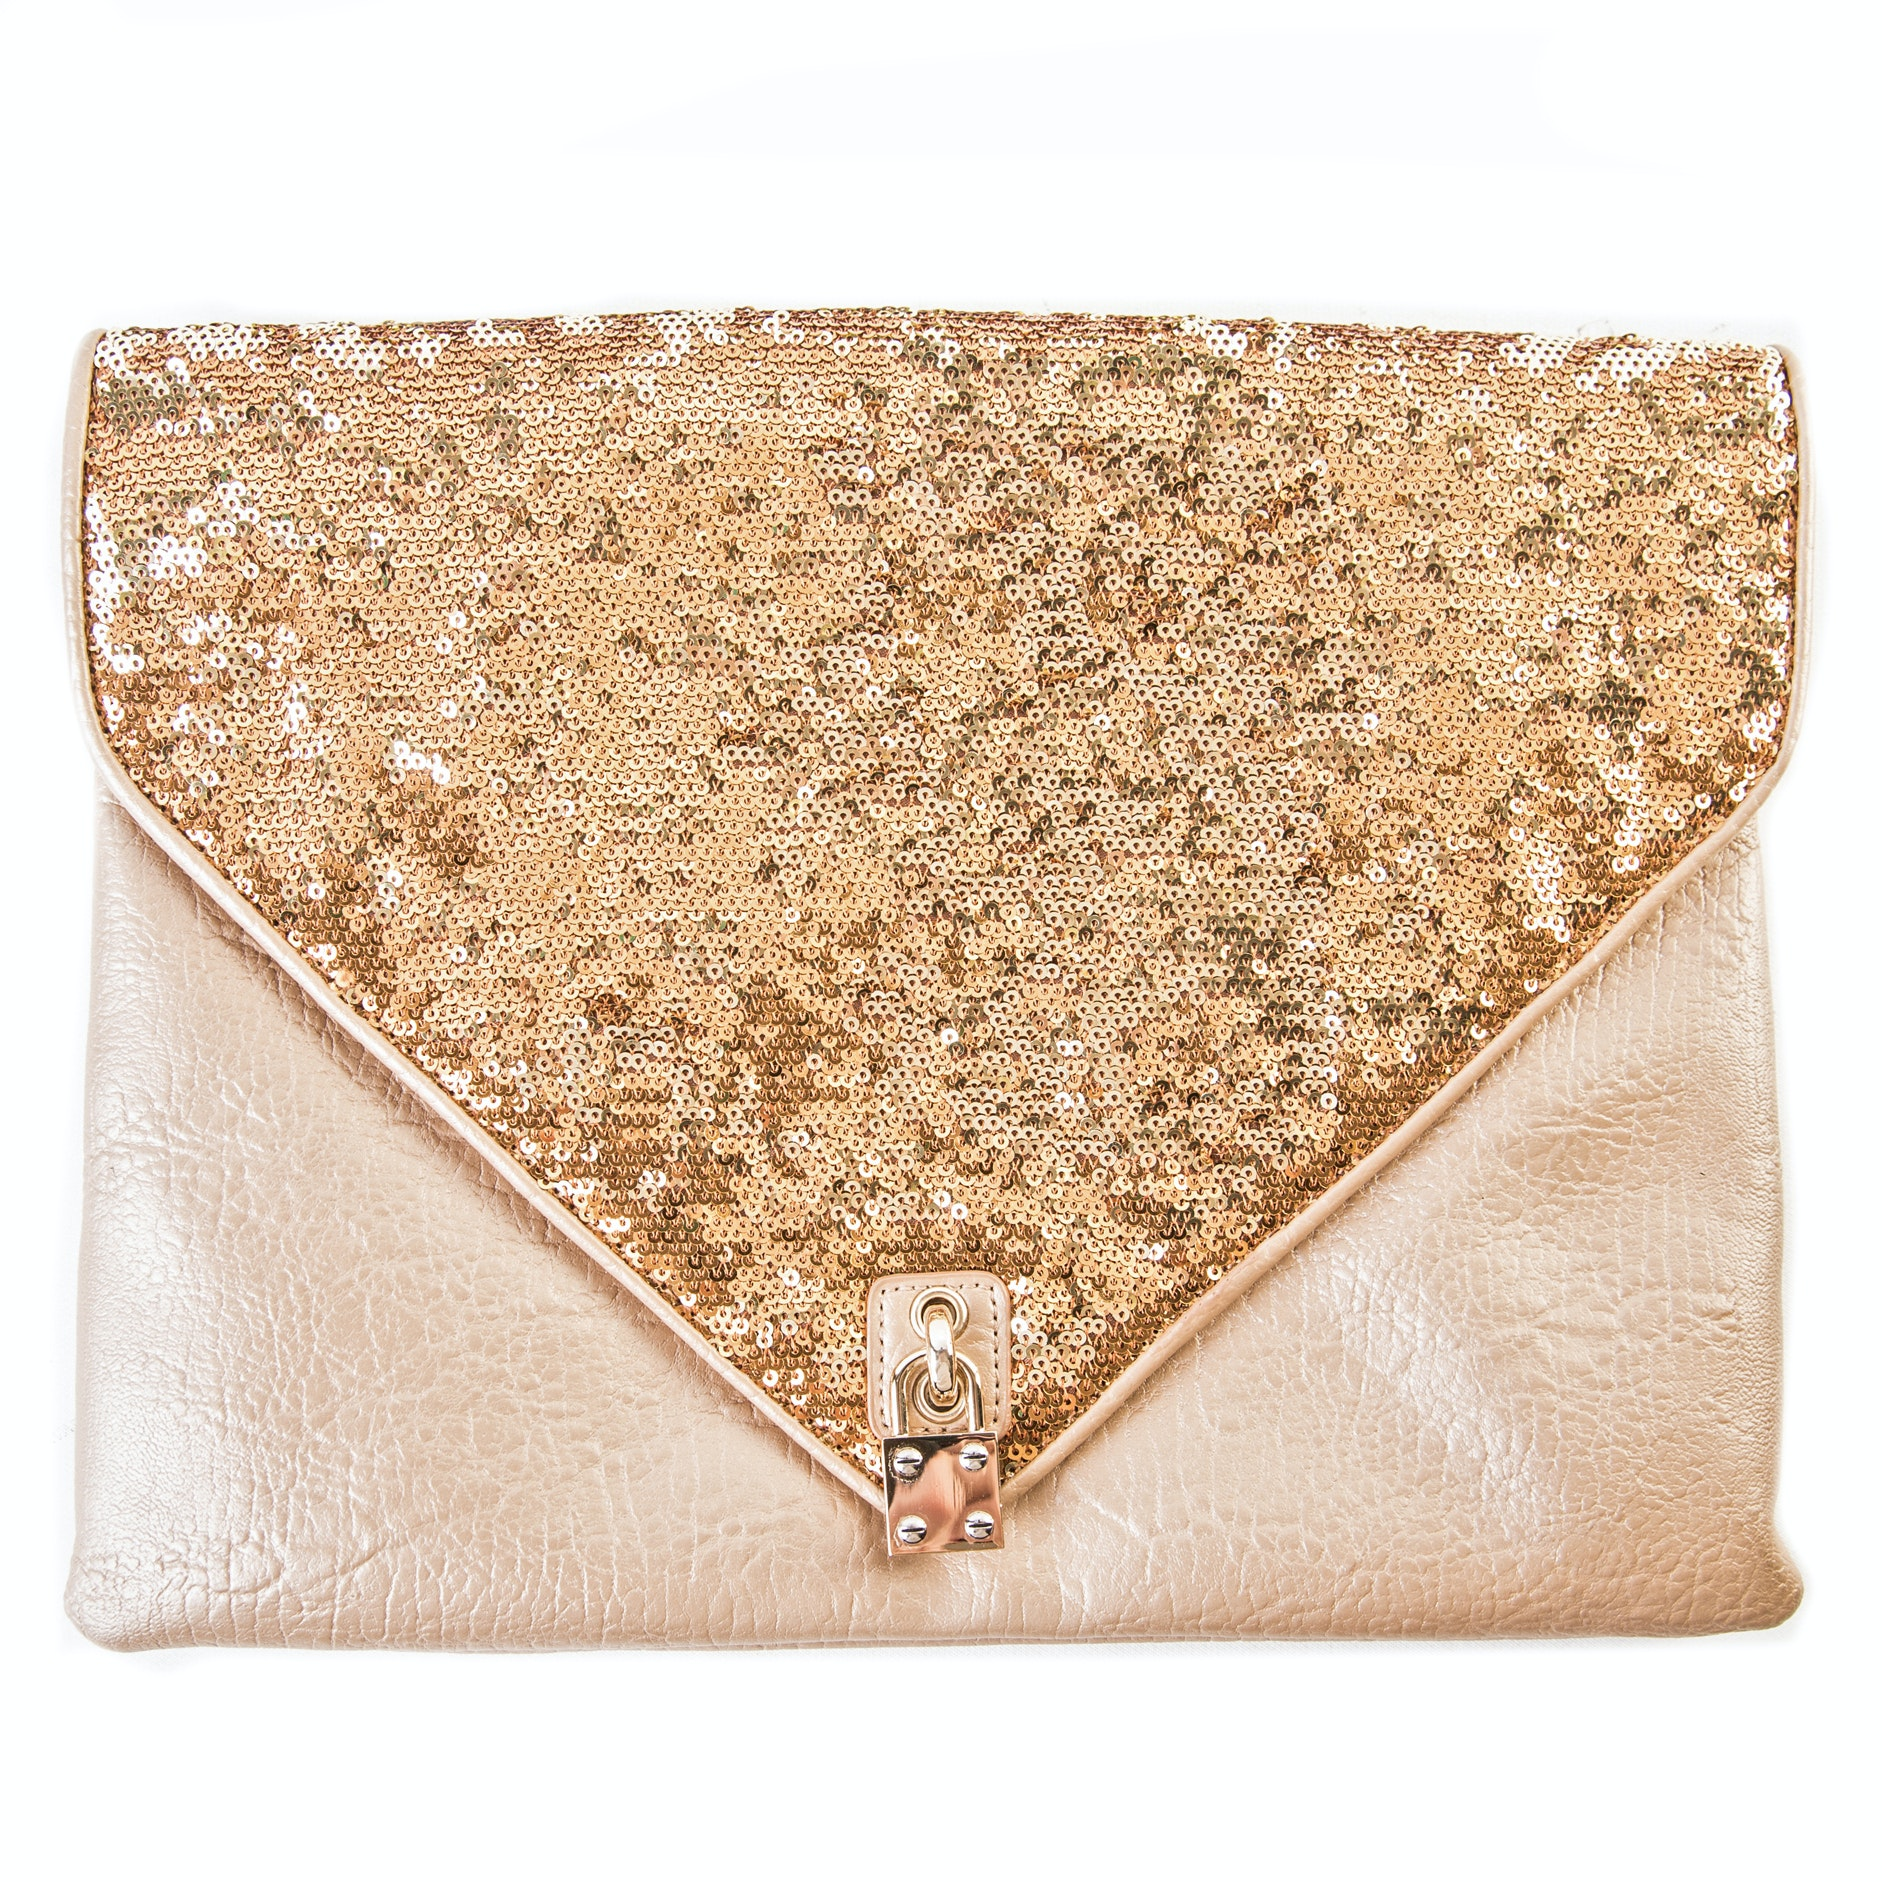 Alexis Hudson Ciara Leather Envelope Clutch